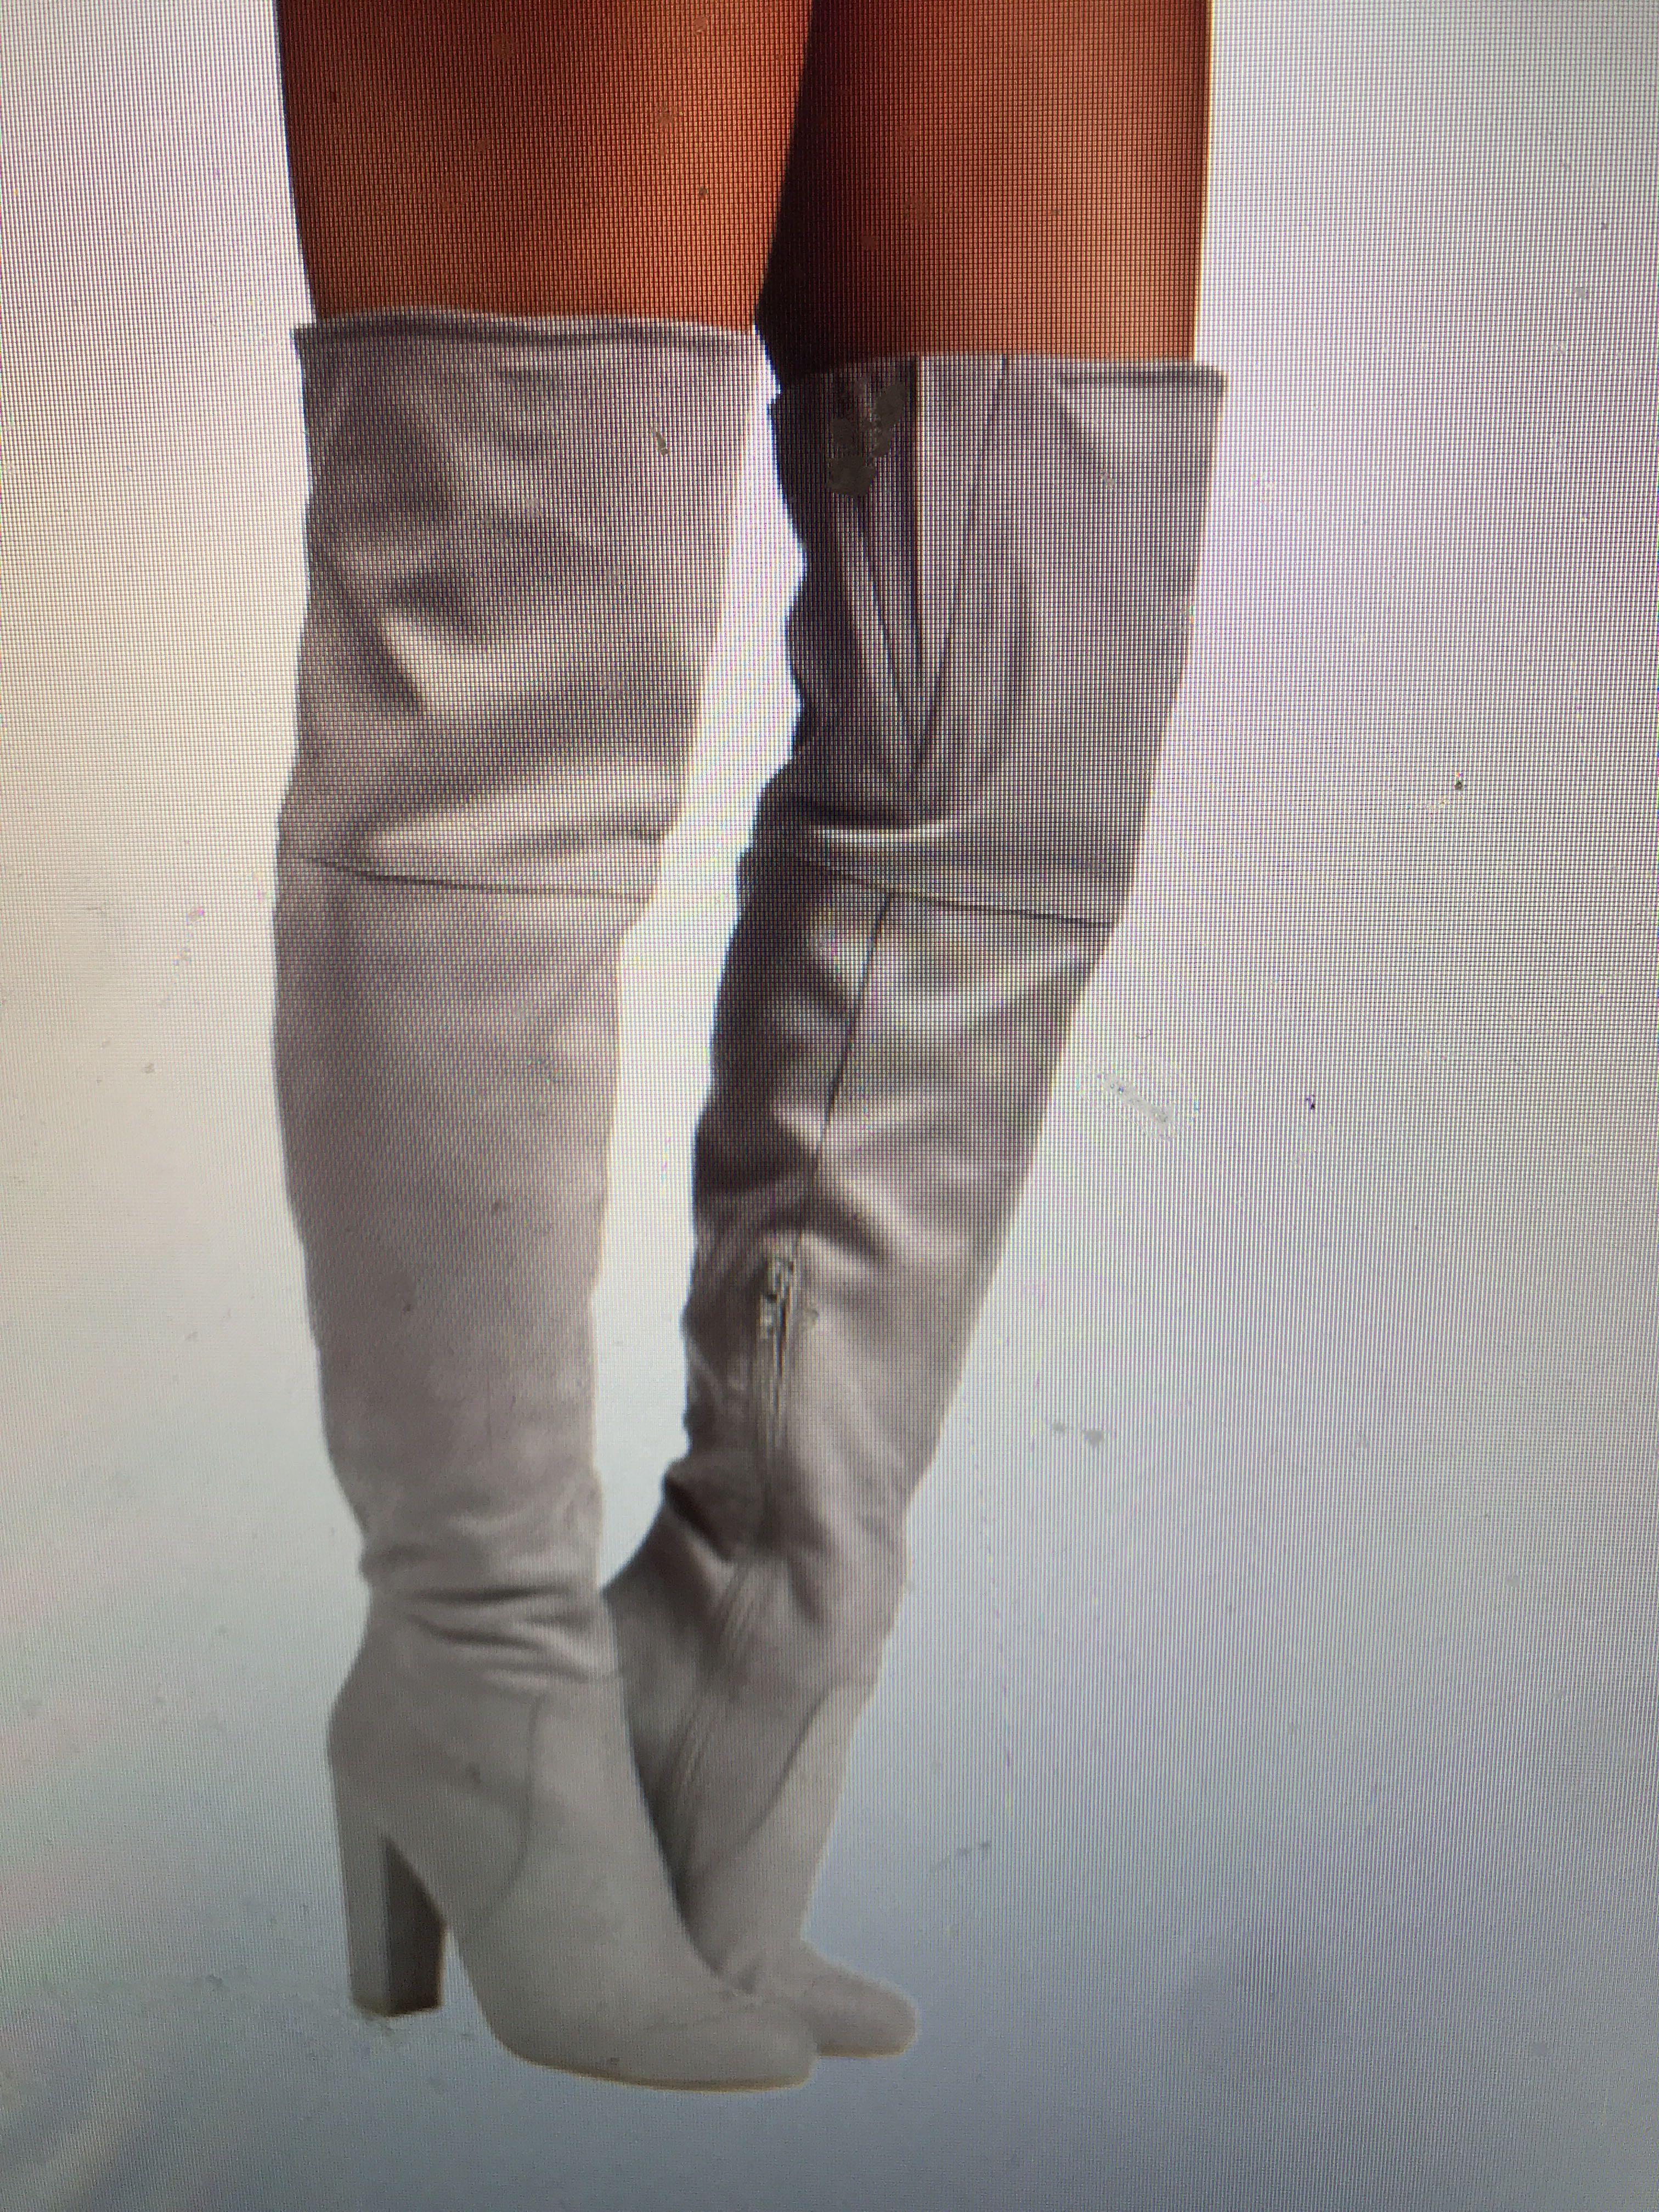 Billing Lara slate grey suede boots